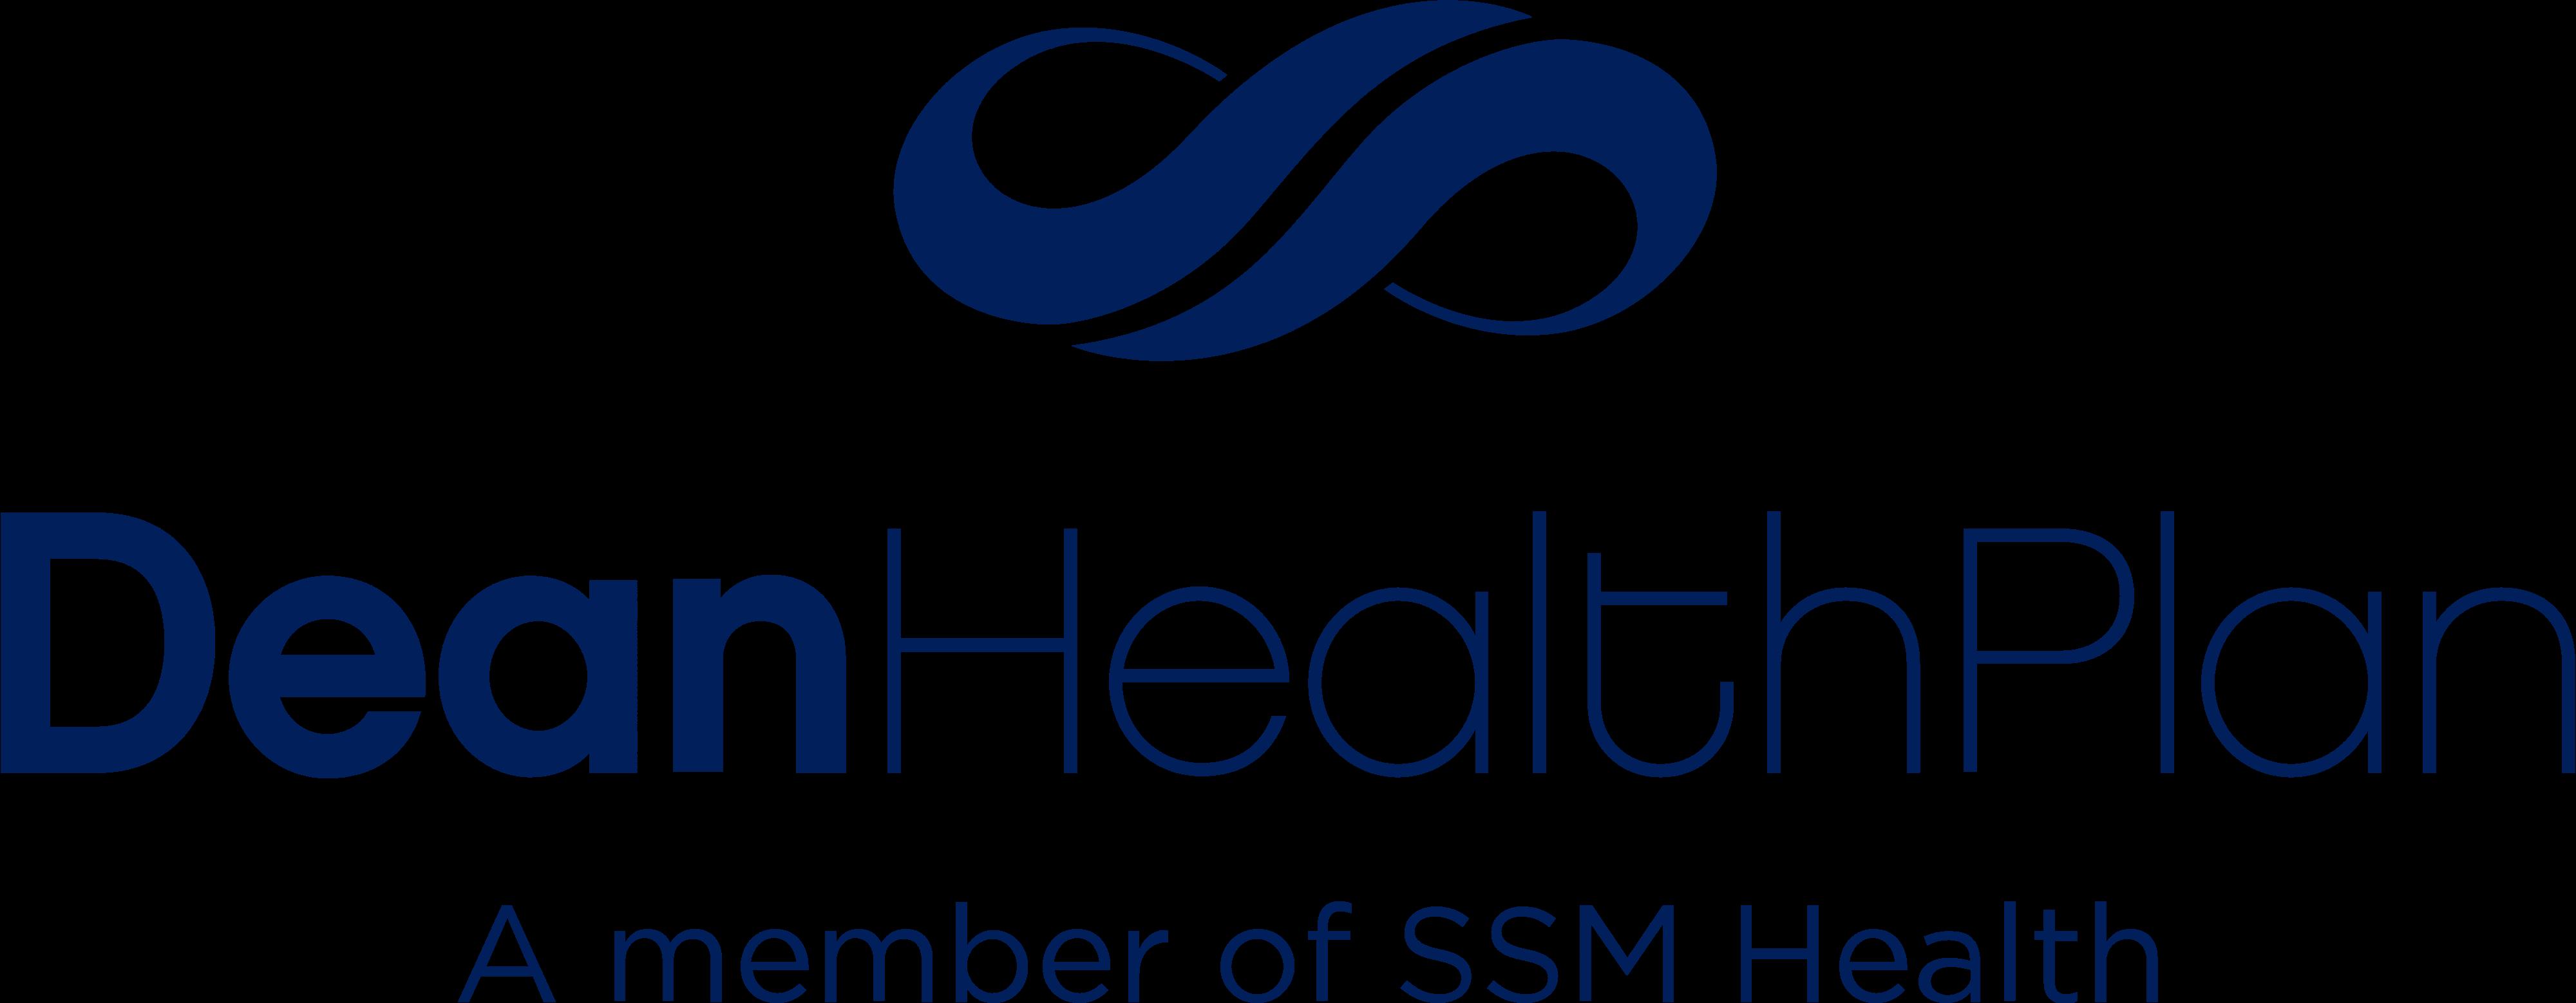 Dean Health Plan – Logos Download